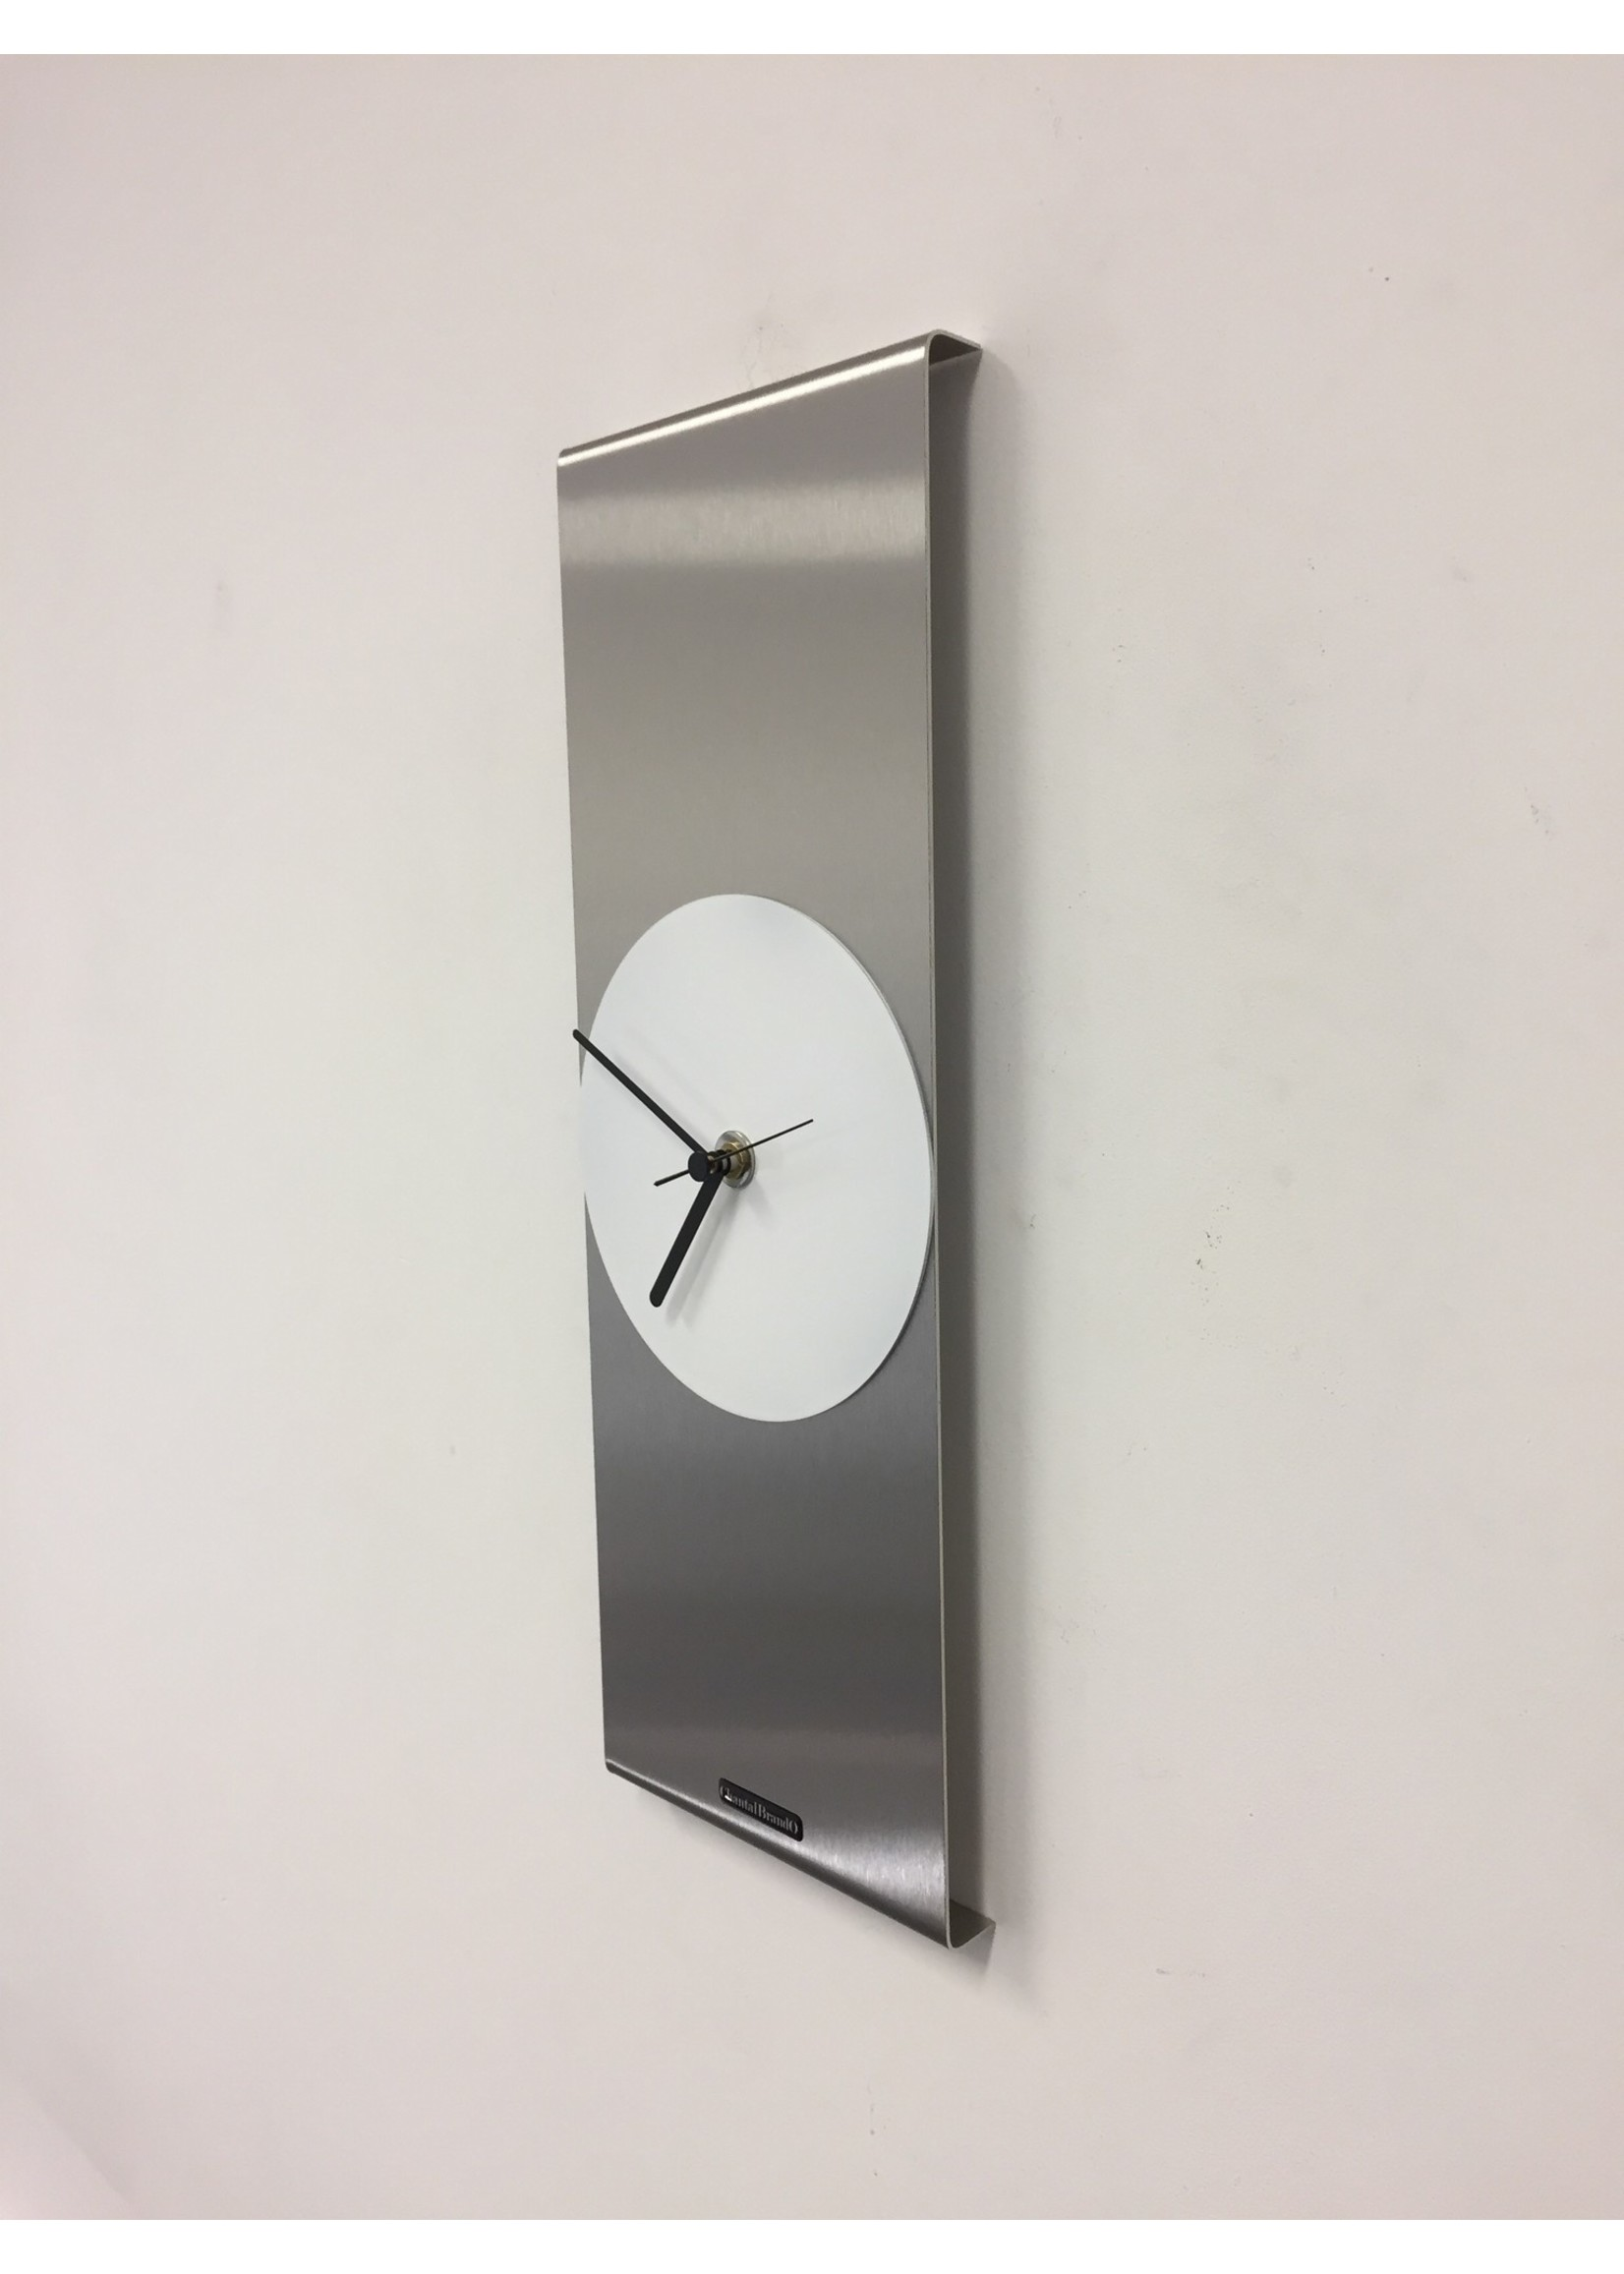 Klokkendiscounter Wandklok ORION WIT MODERN DESIGN CP